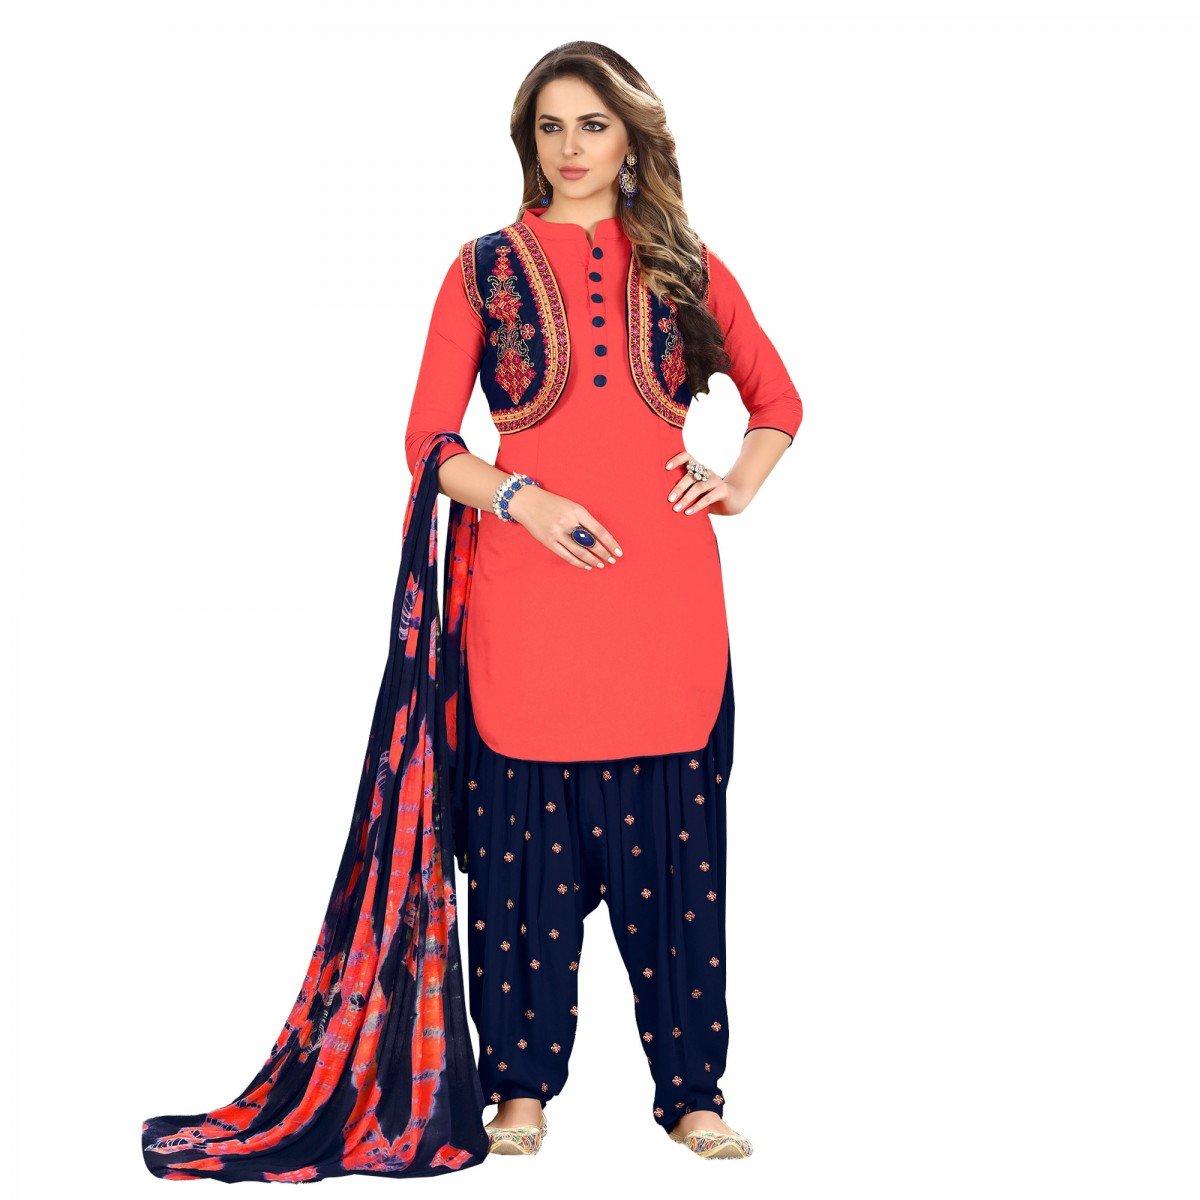 Delisa Ready Made Patiala Salwar Embroidered Cotton Salwar Kameez Suit India/Pakistani Dress (Orange Red, MEDIUM-40)